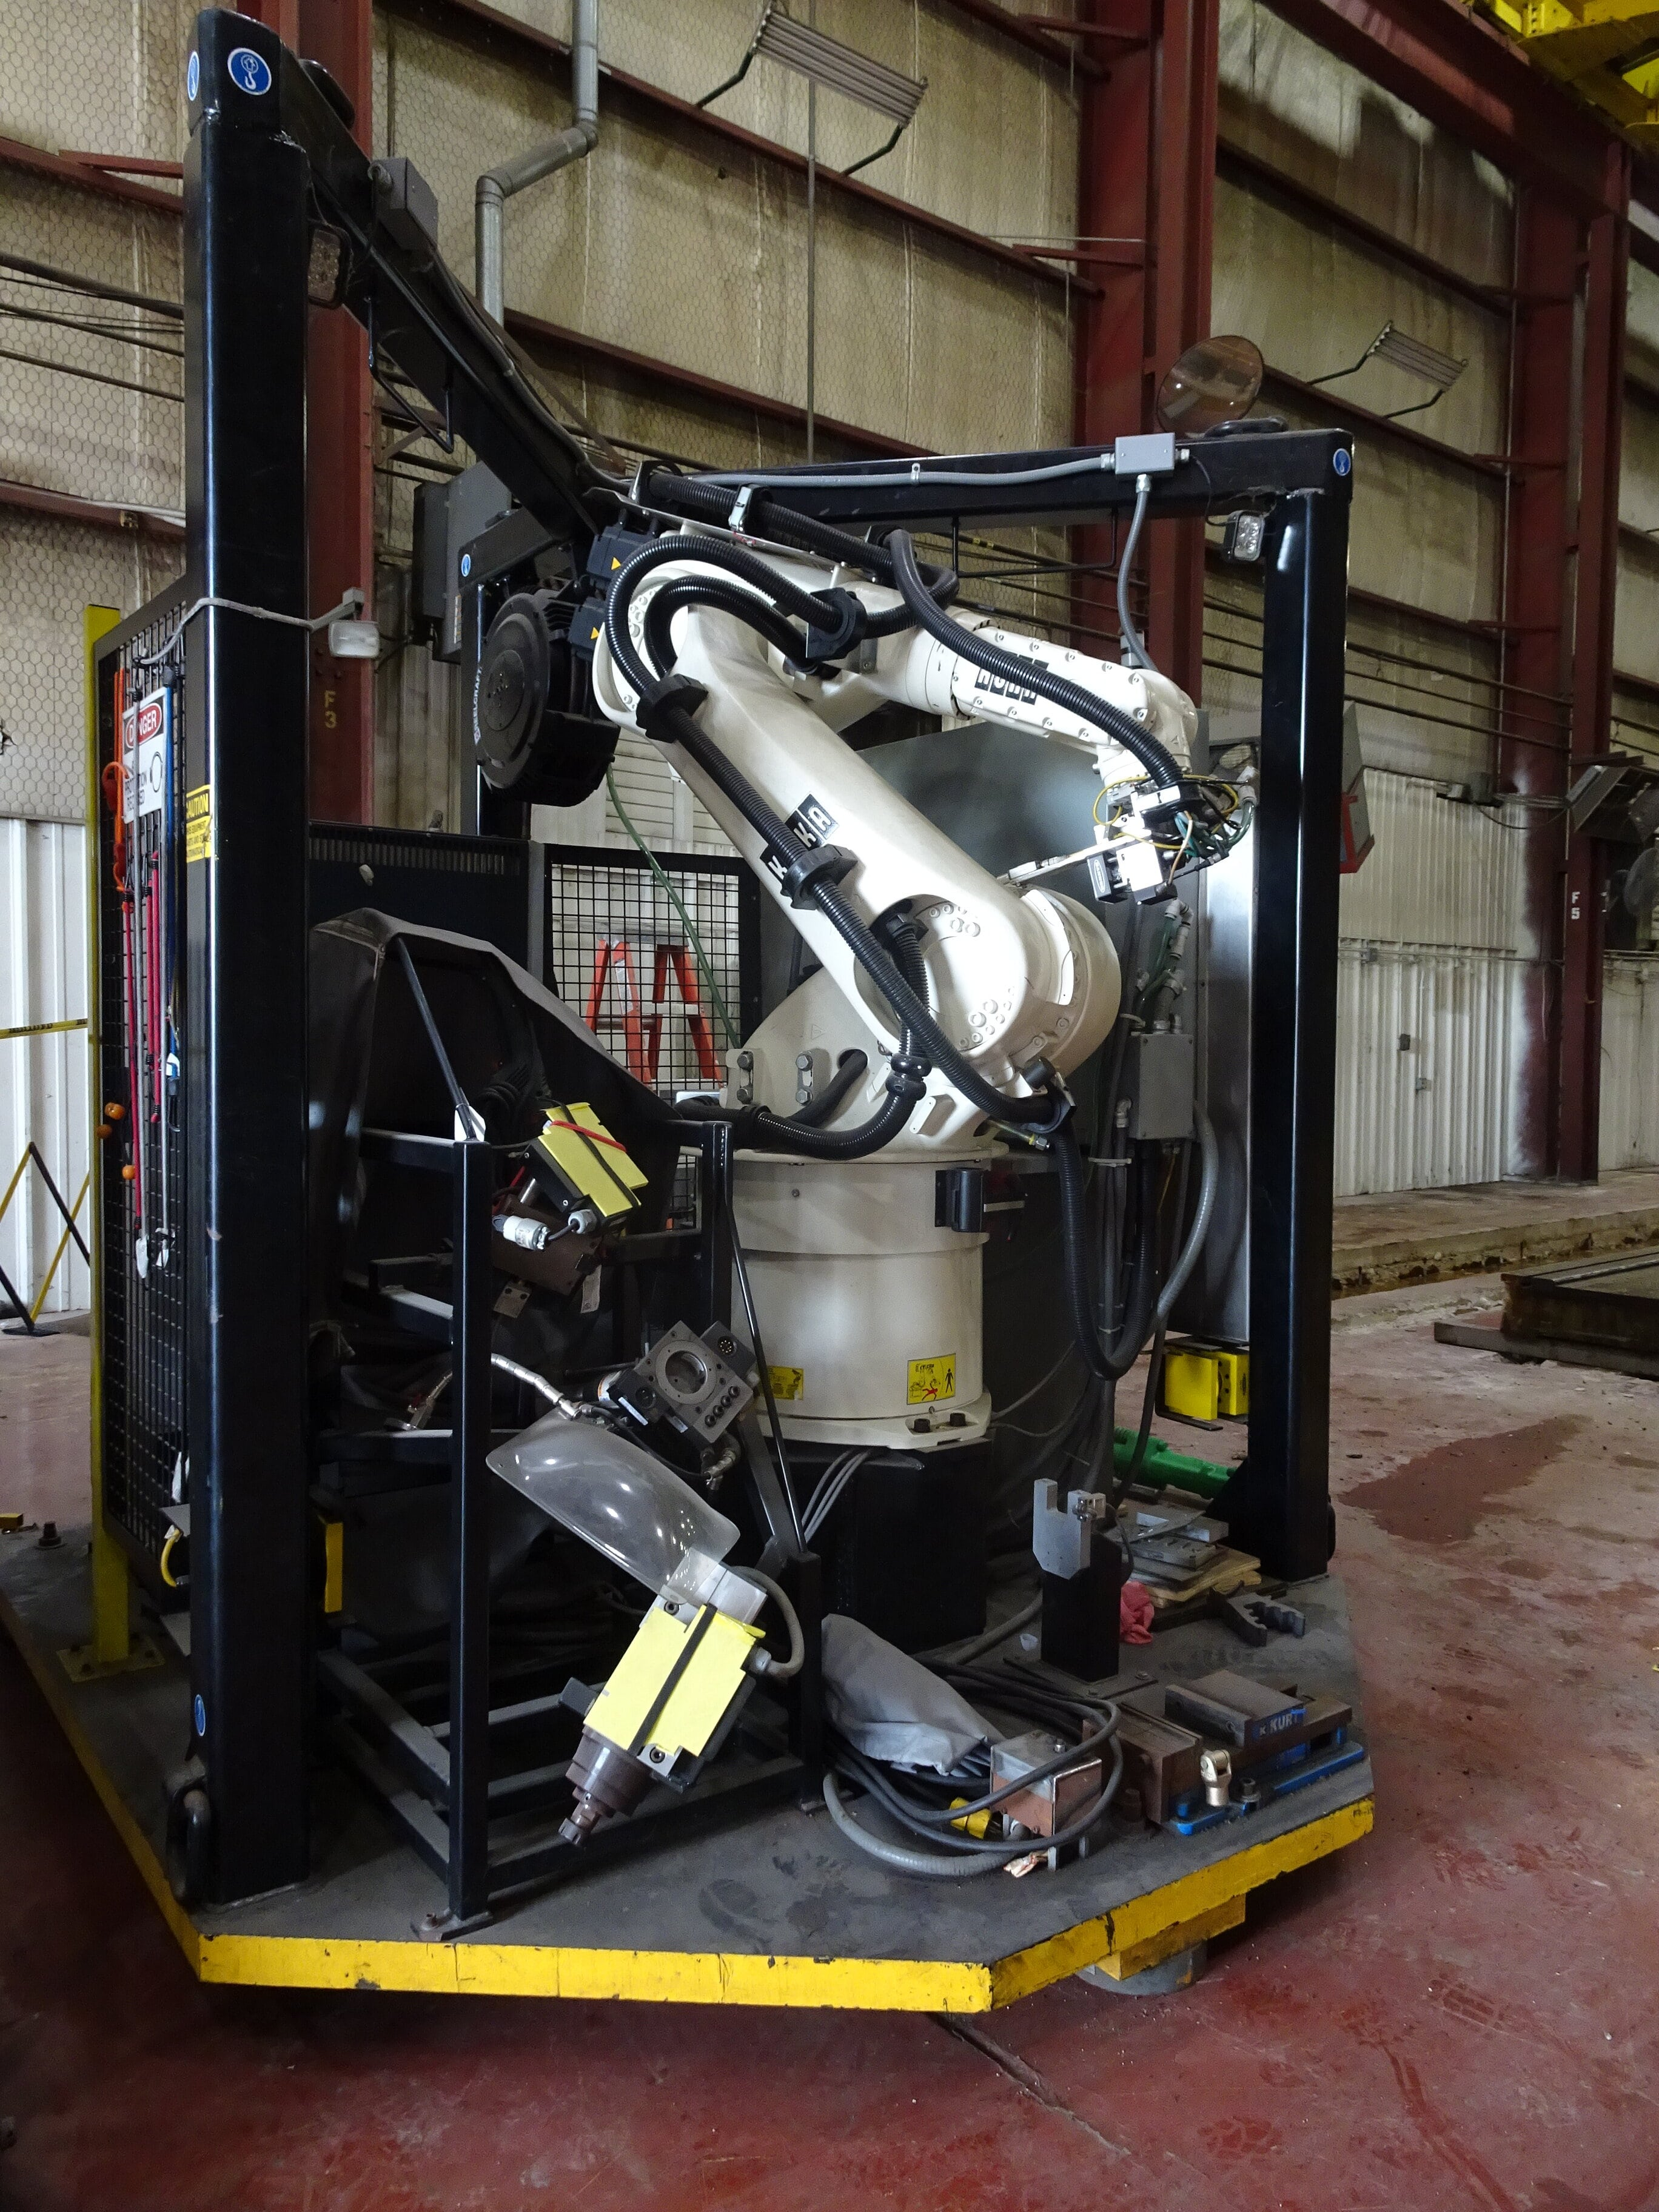 2010 Kuka KR 60L45A 2230 MM Range Robot Arm (Lot 168)